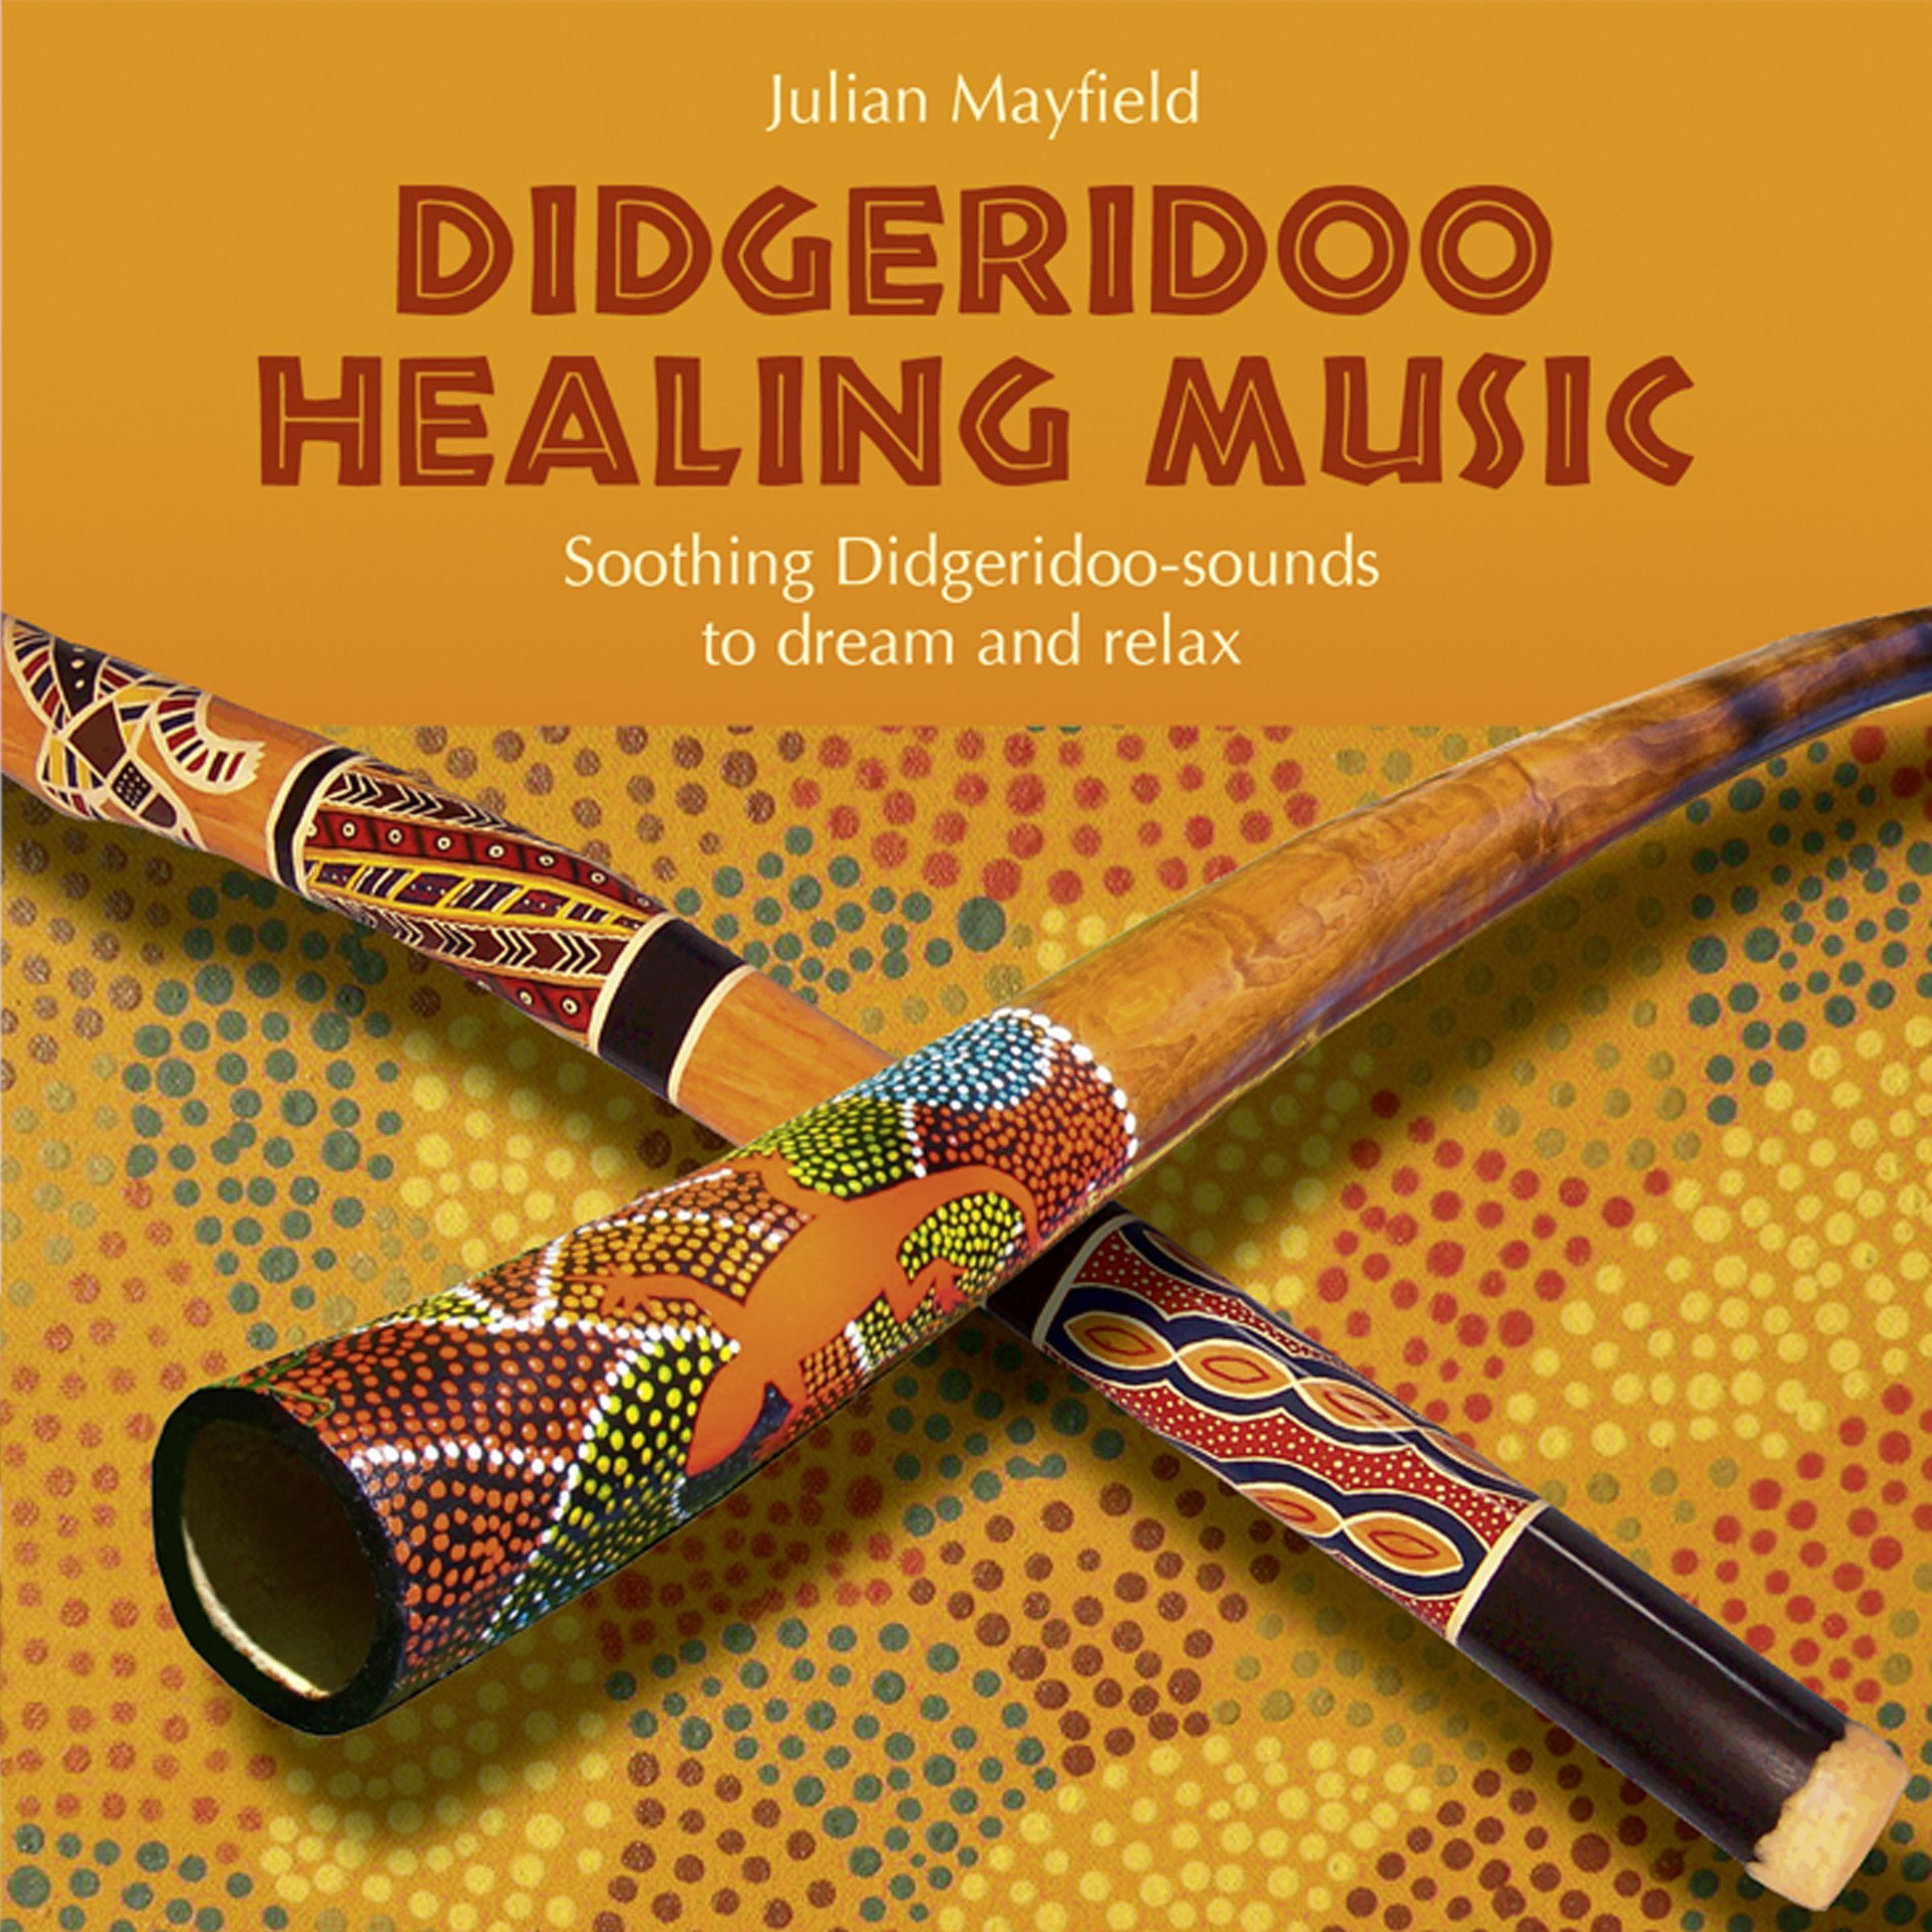 Didgeridoo Healing Music Julian Mayfield